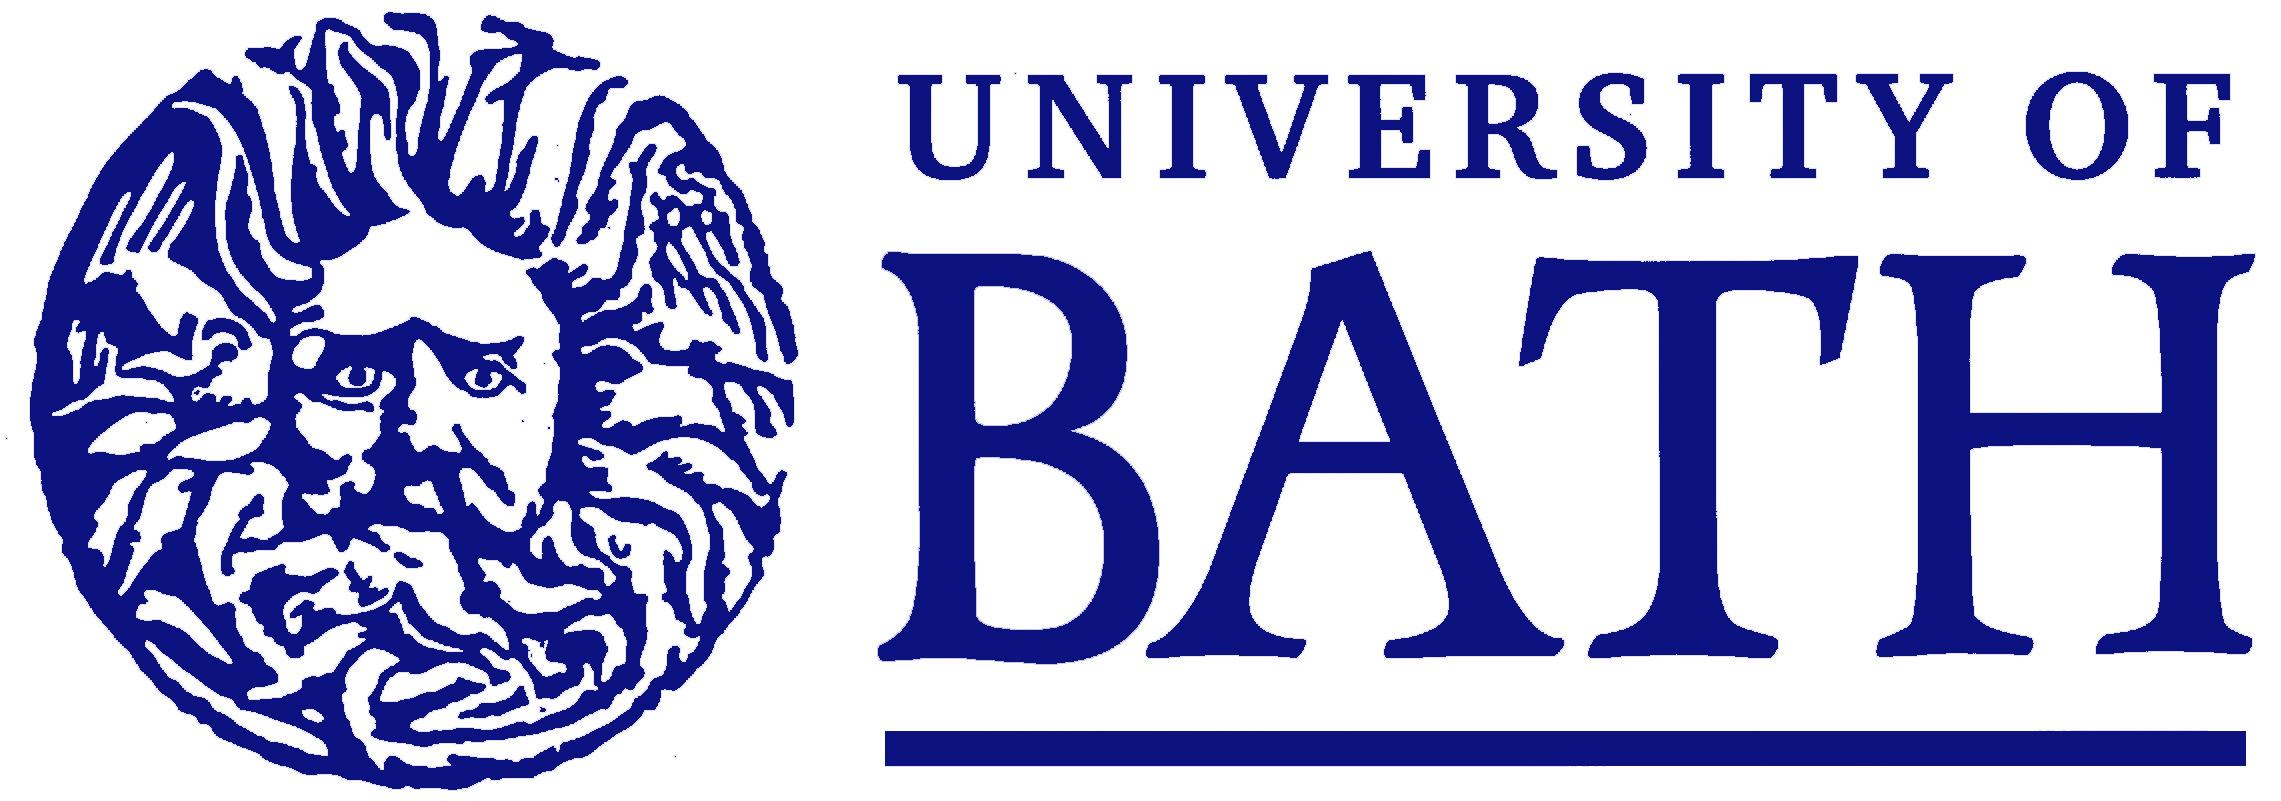 bath university nightclub design